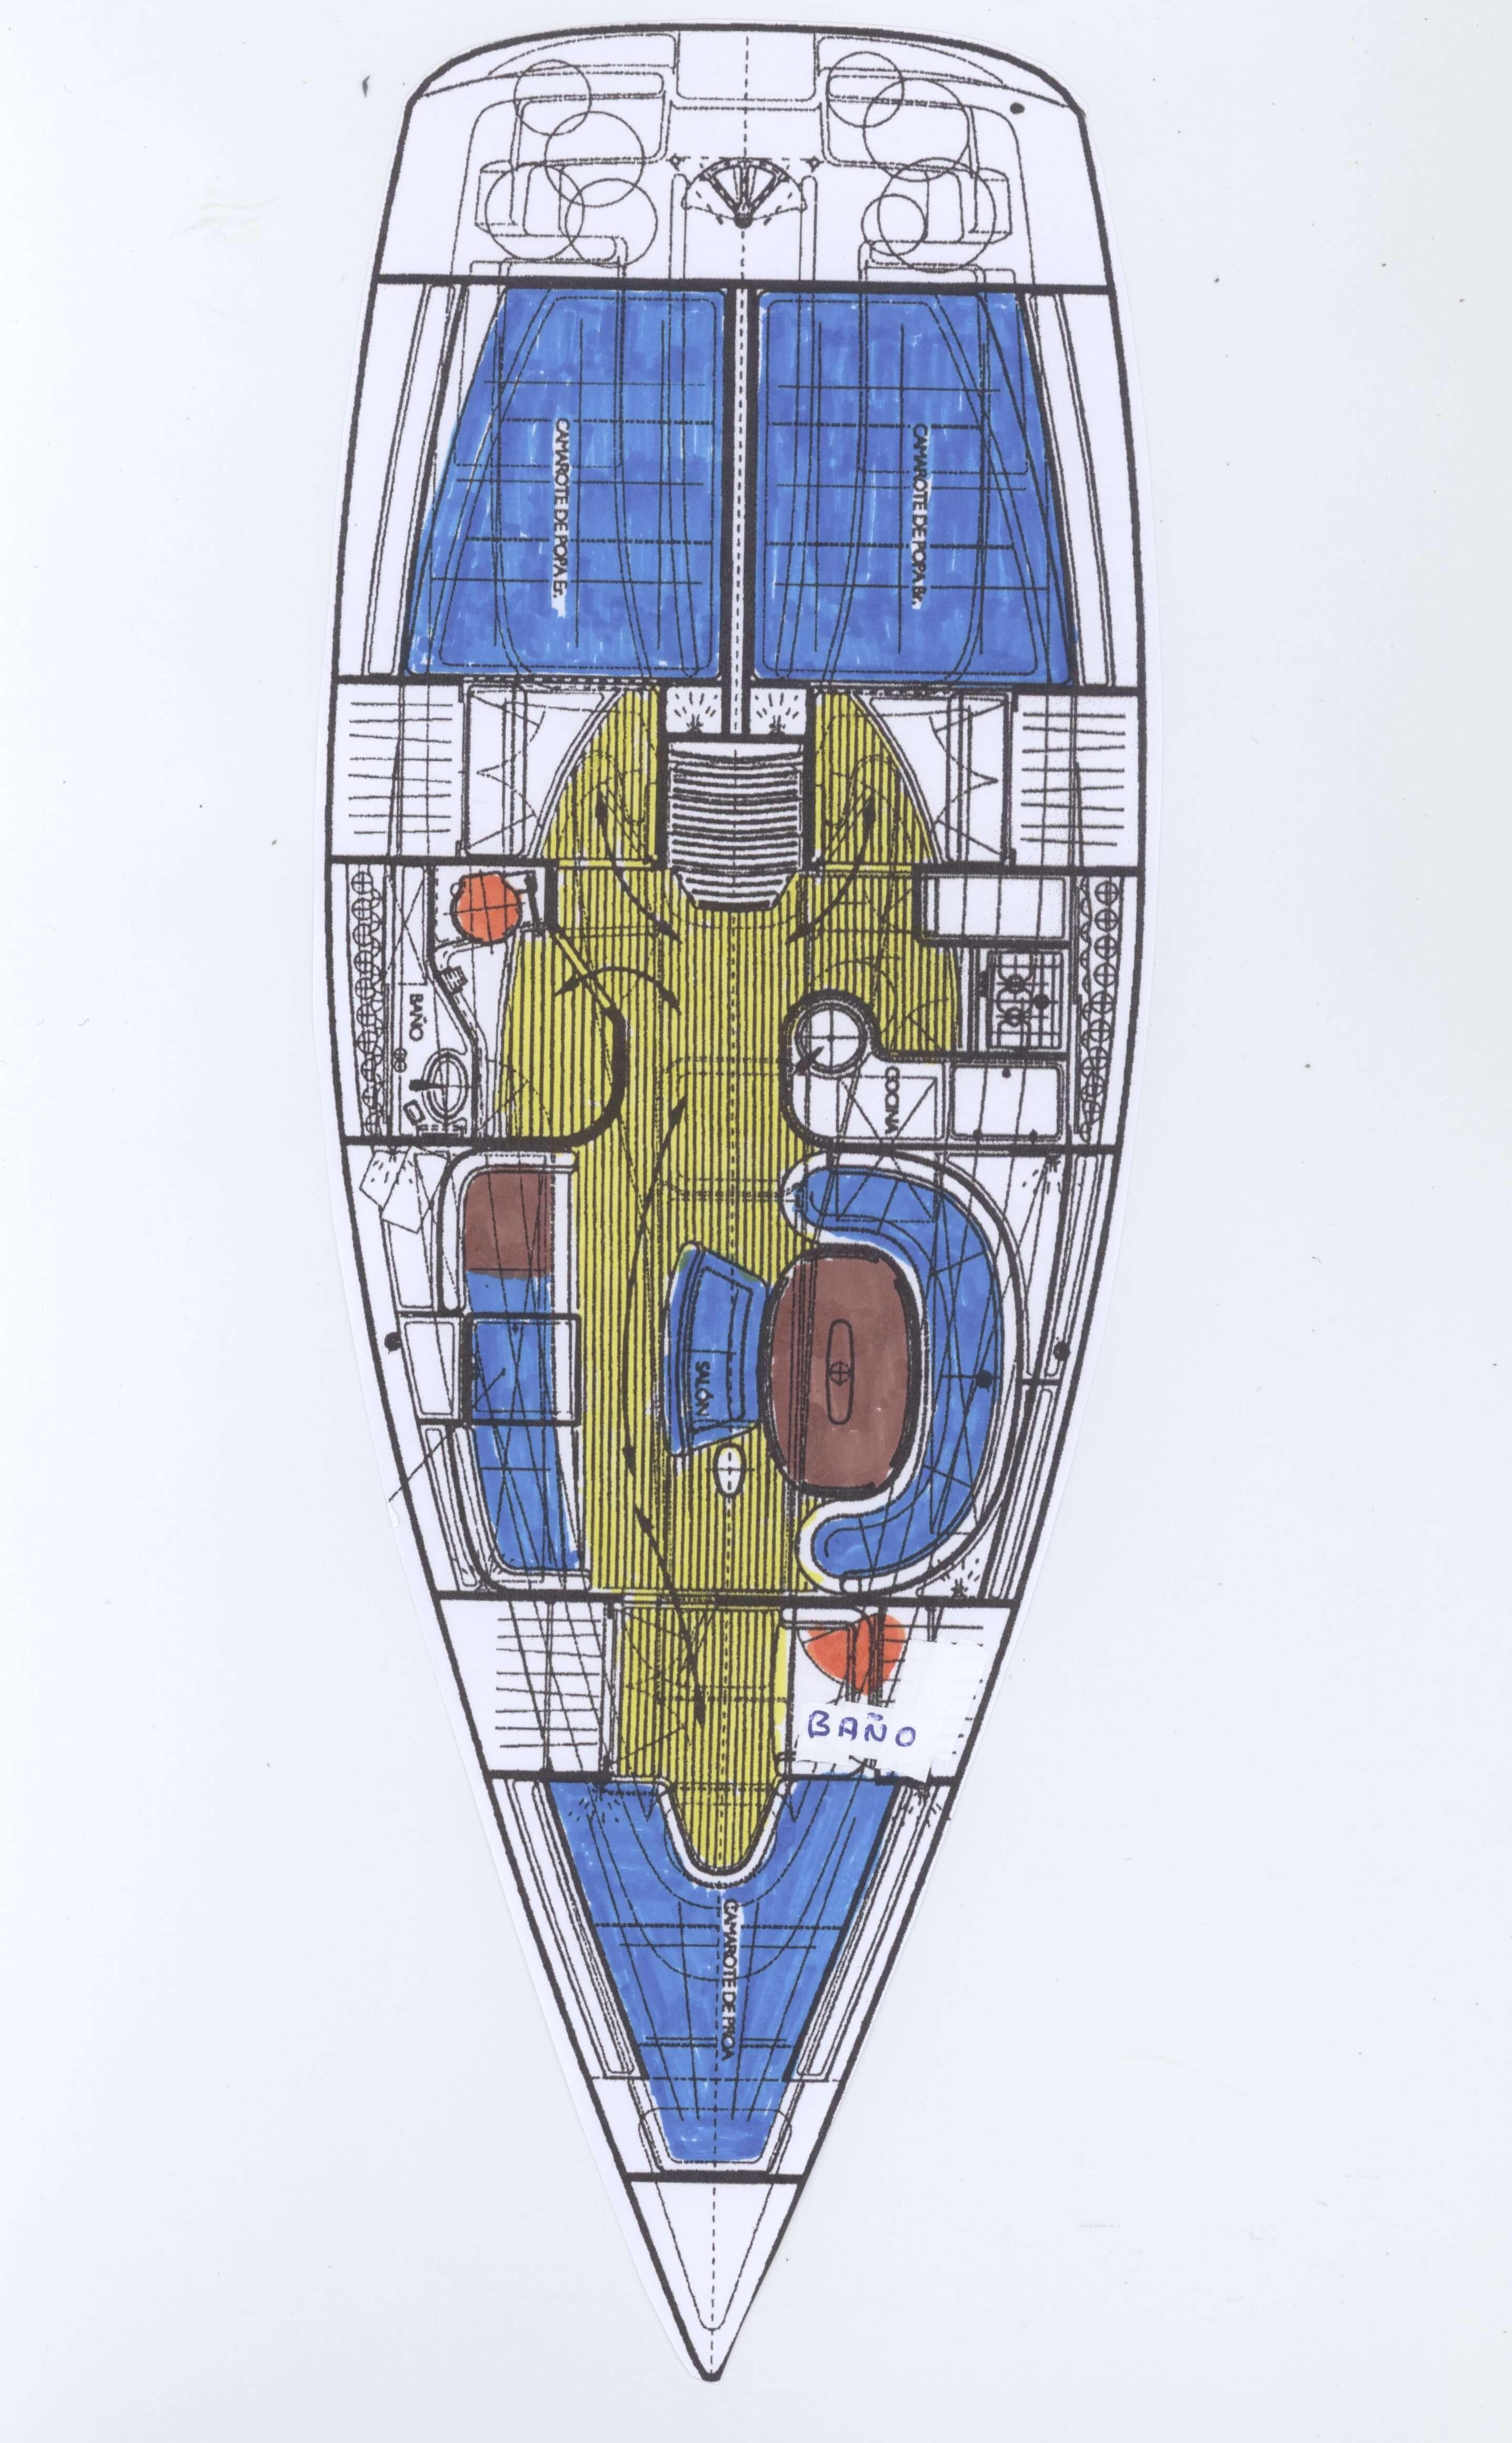 Ro400_planta_Sailway_charter_Galicia_Ria_Vigo